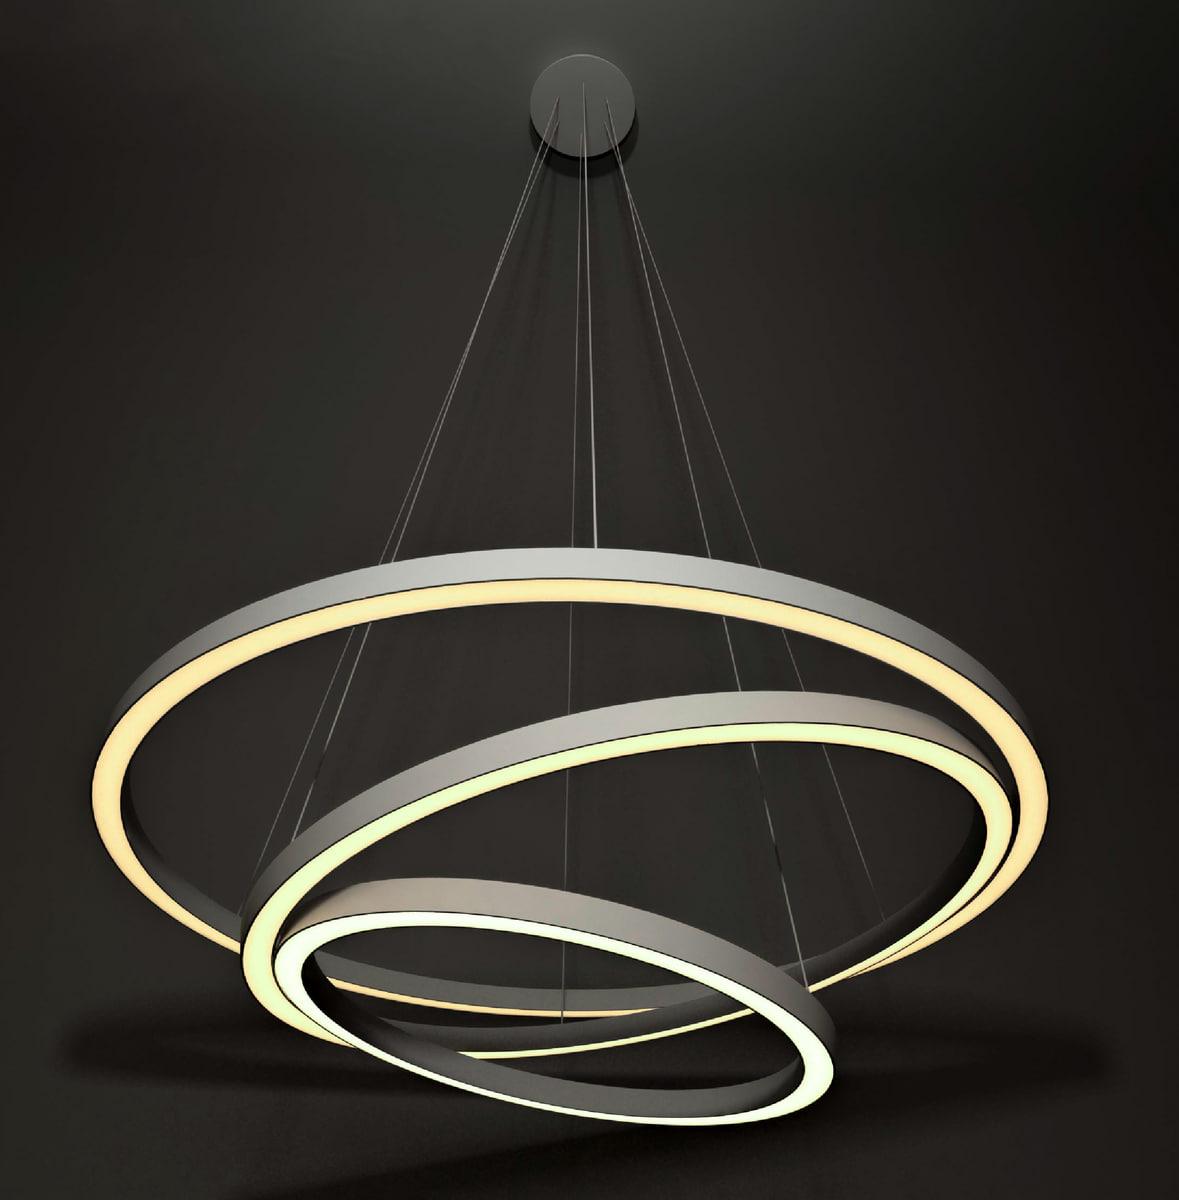 Uv Light Fixture